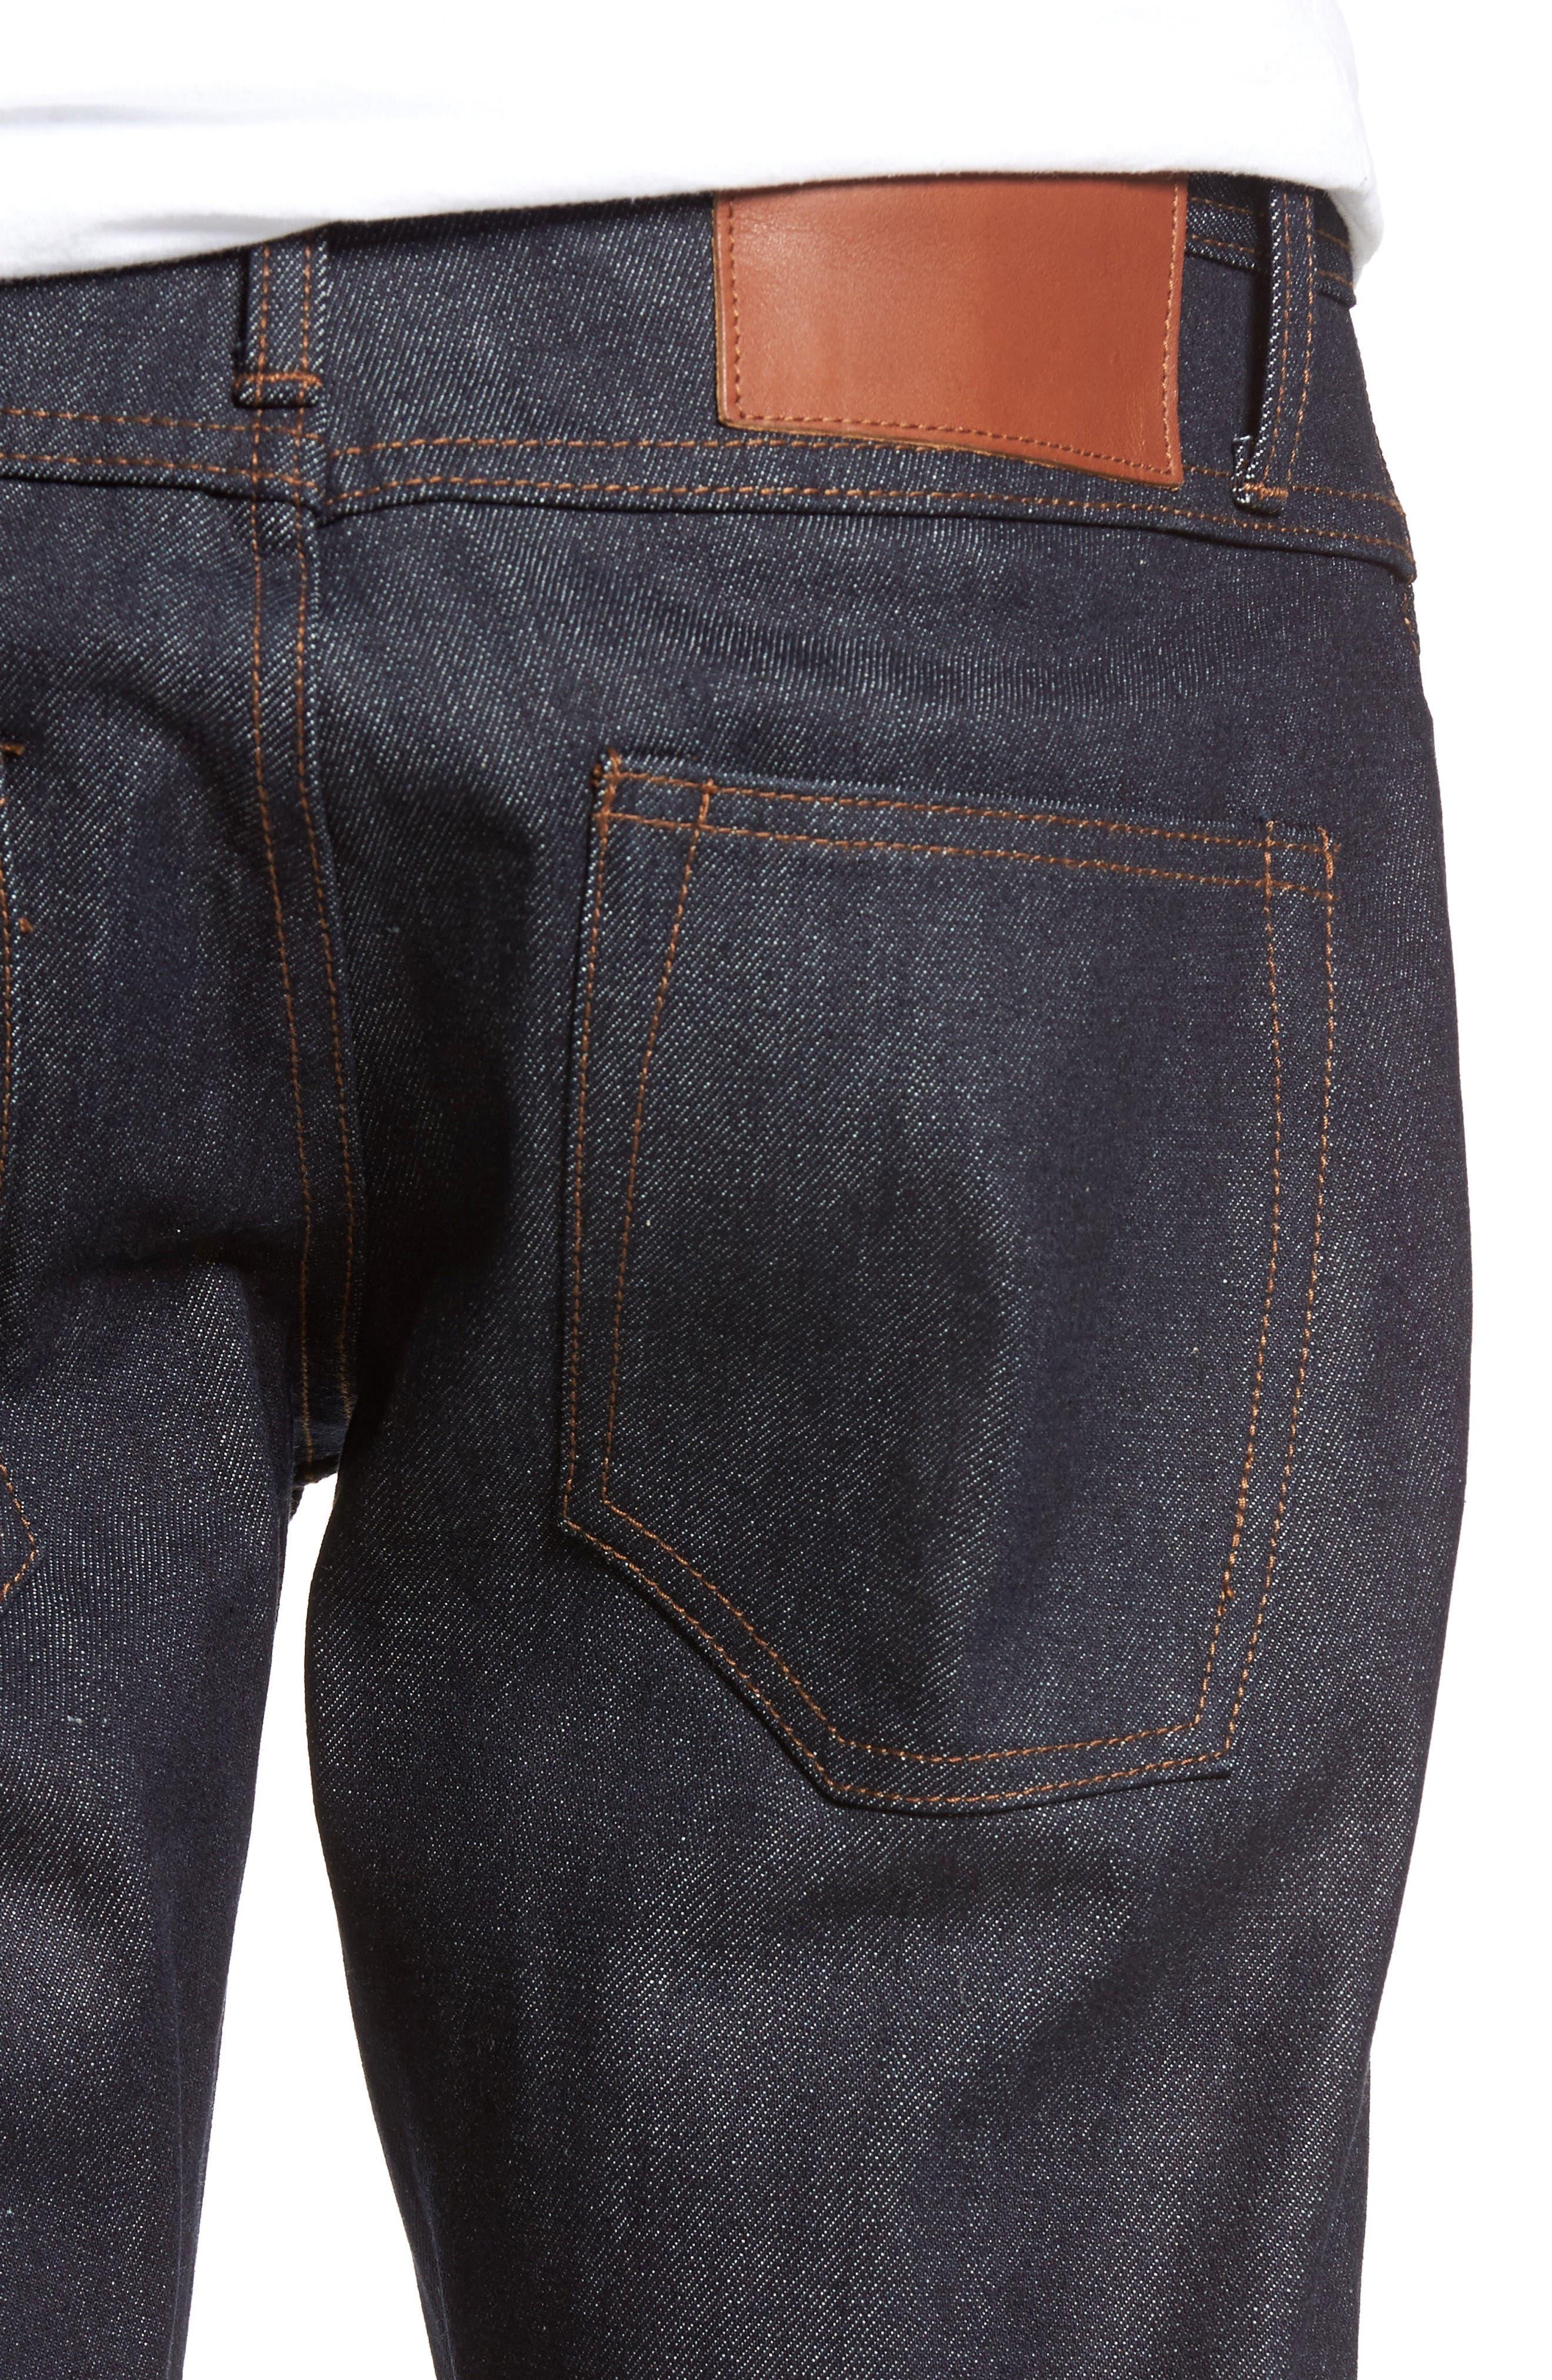 UB301 Straight Leg Raw Selvedge Jeans,                             Alternate thumbnail 4, color,                             INDIGO